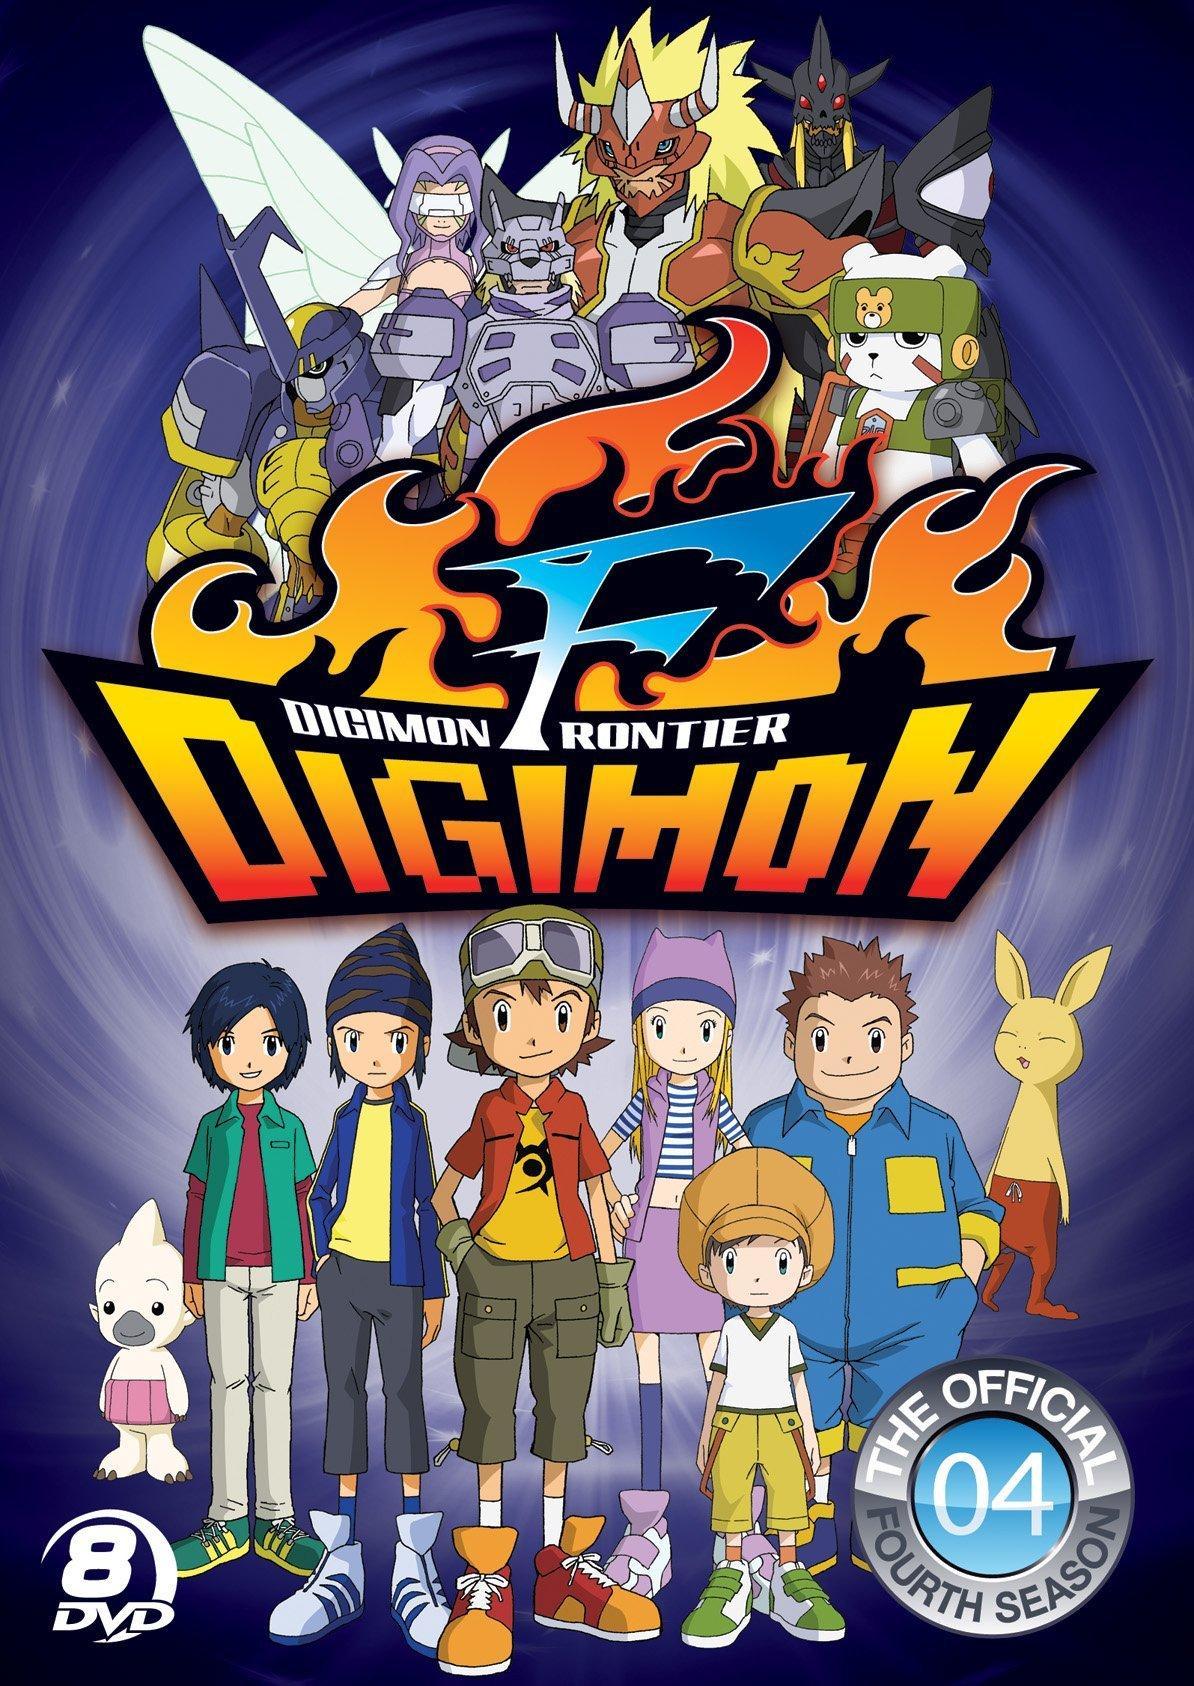 https://mirai.ai/wp-content/uploads/Digimon-Frontier-0.jpg